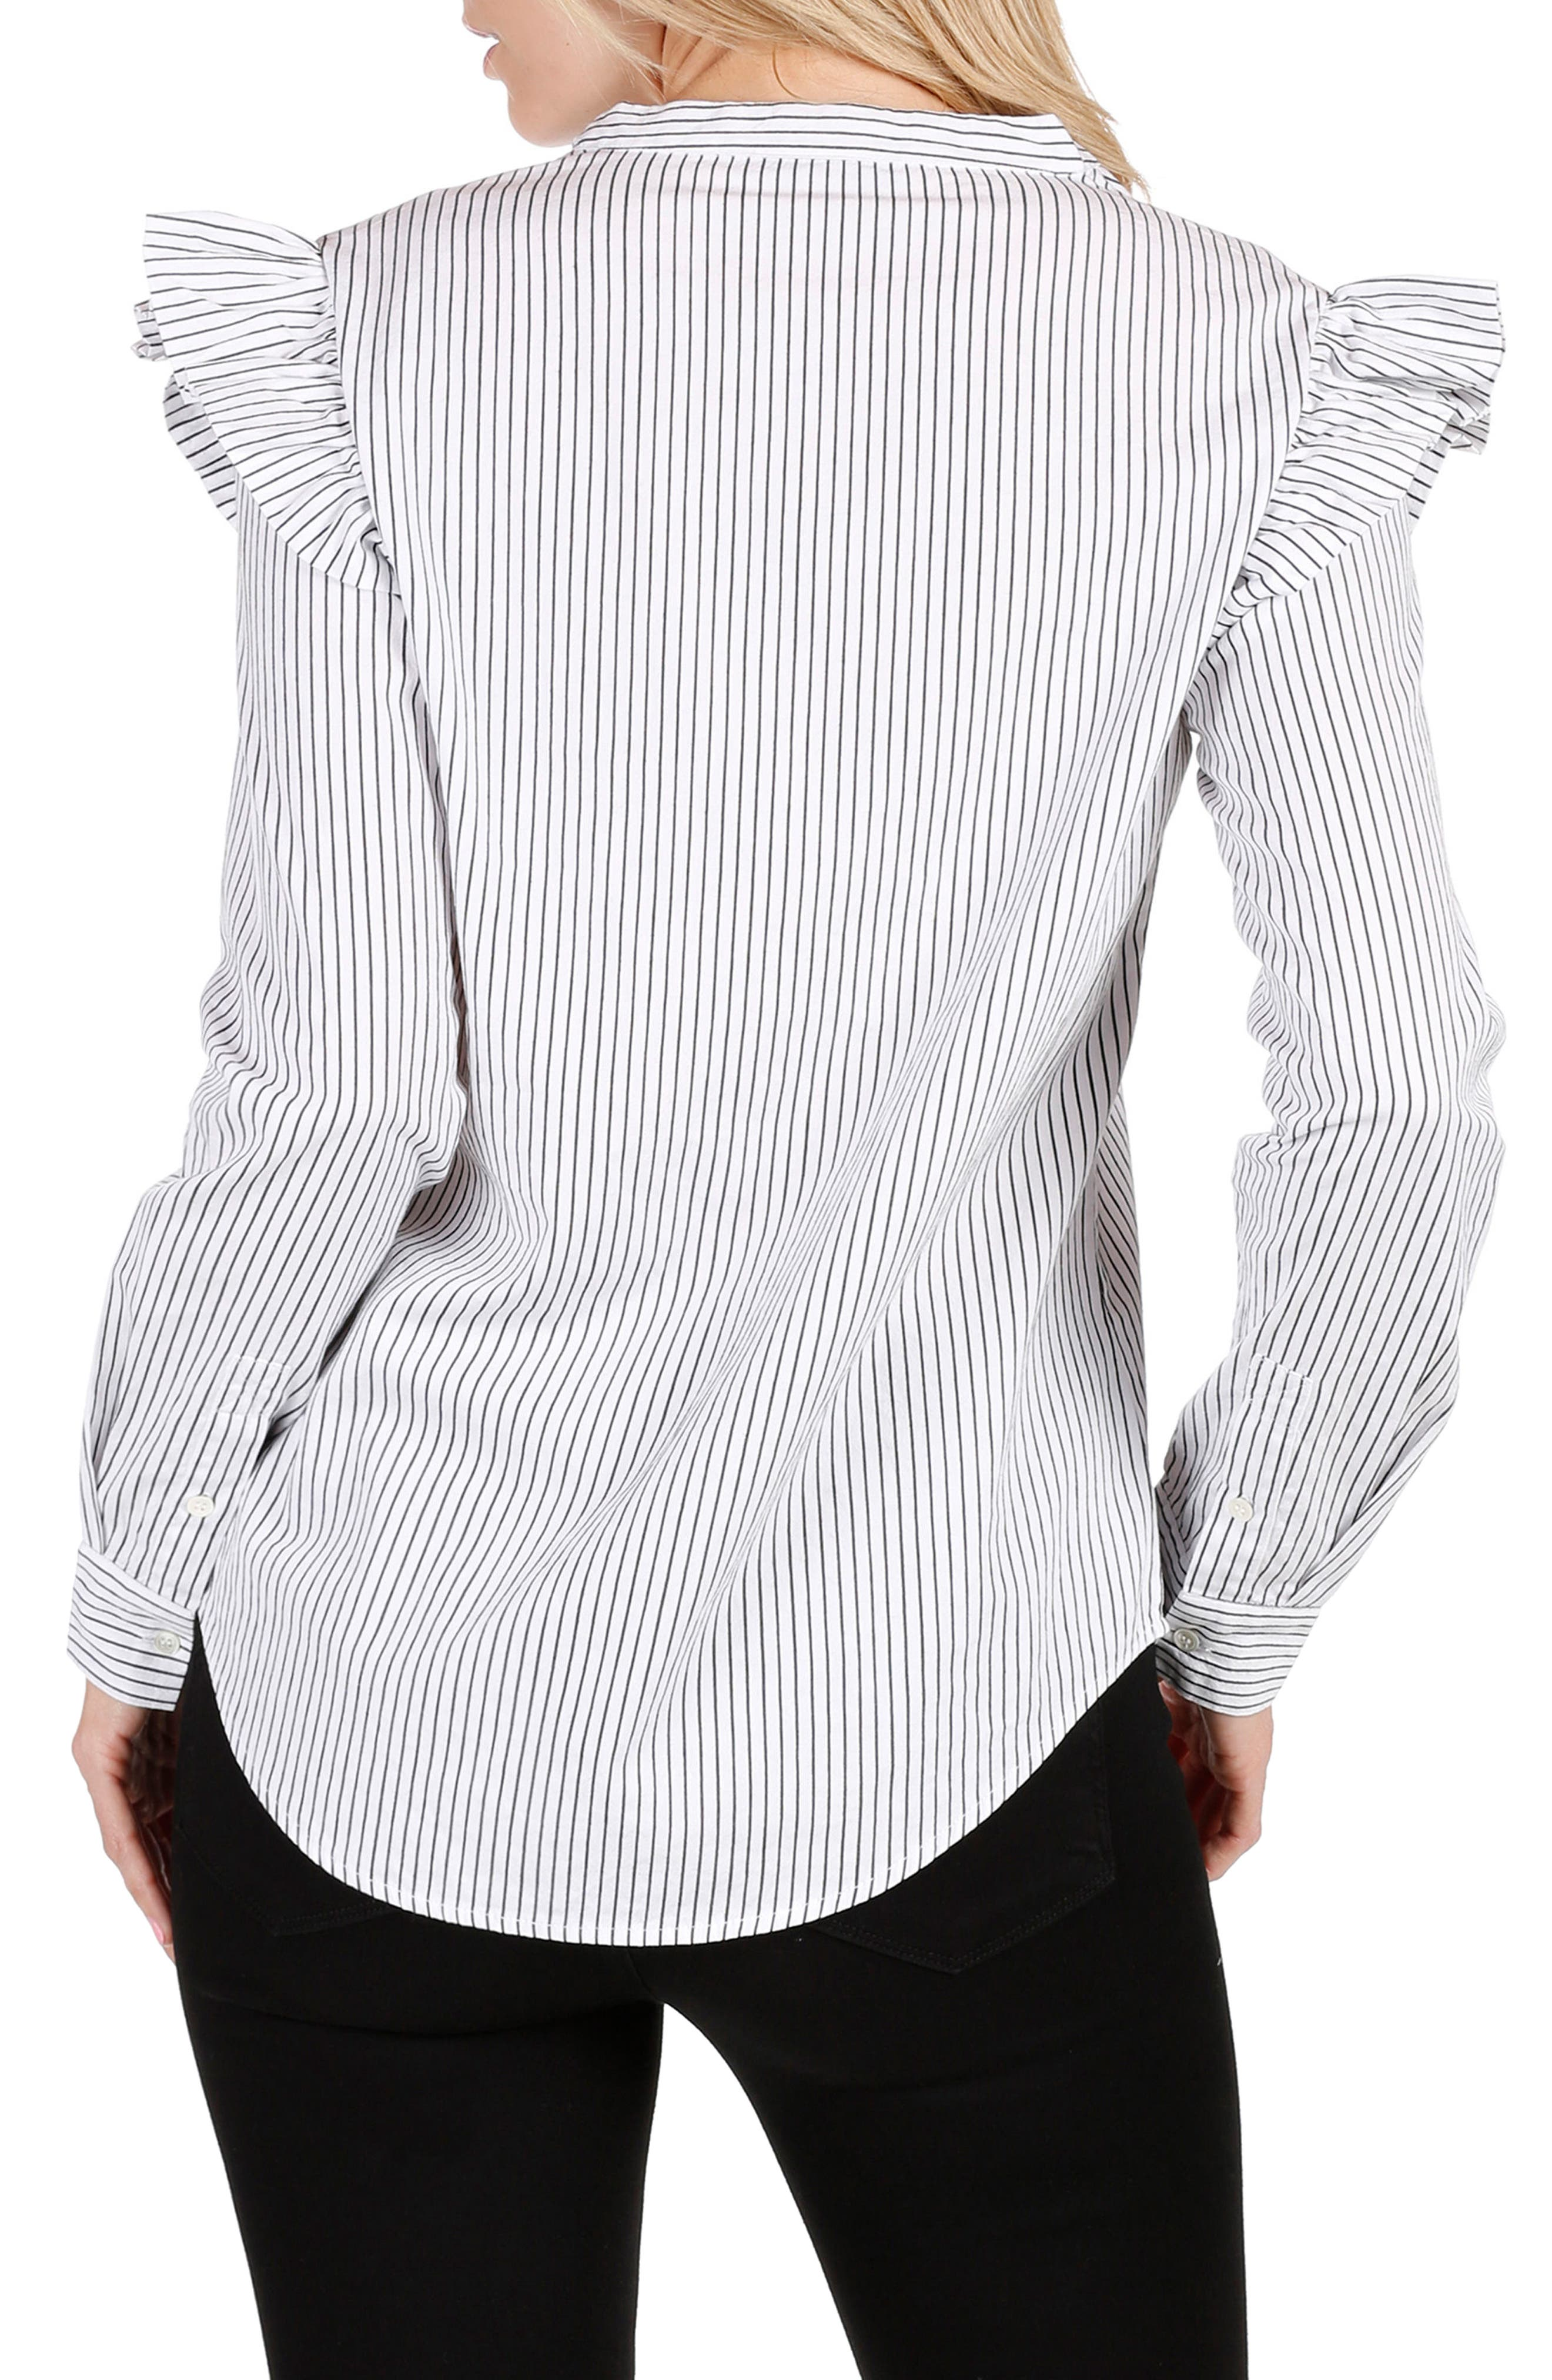 Jenelle Ruffle Dress Shirt,                             Alternate thumbnail 3, color,                             Black/ White Stripe